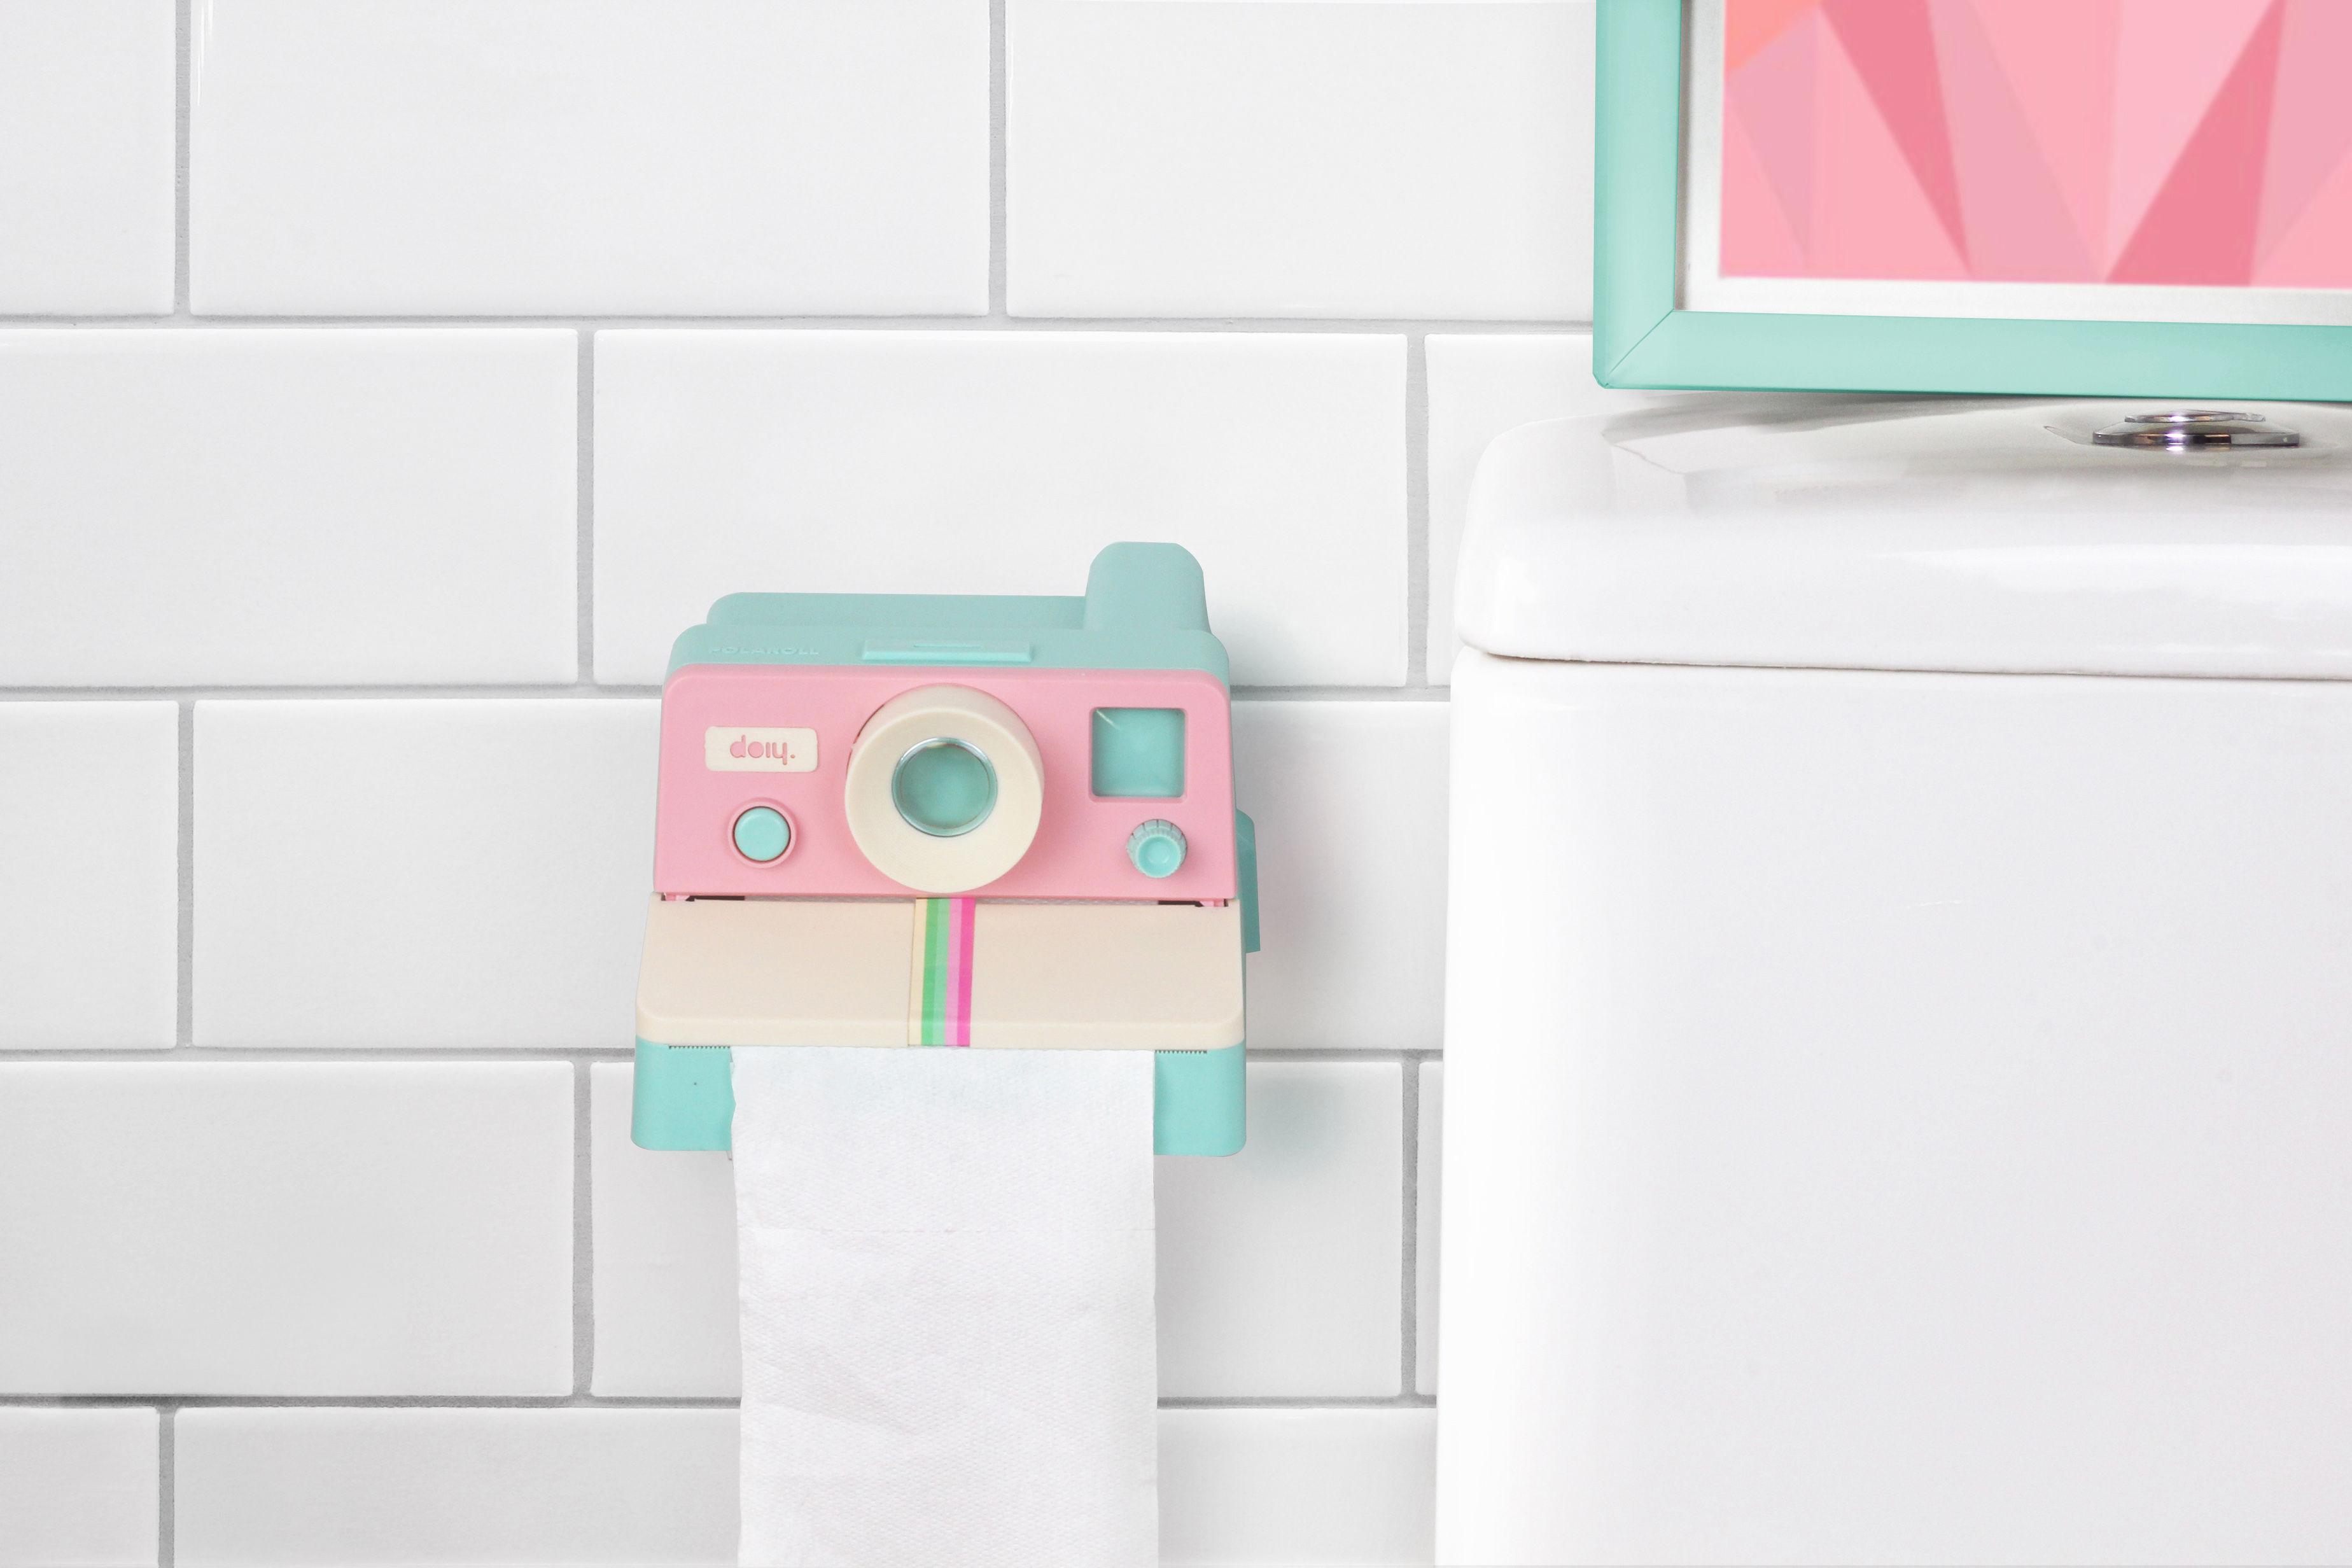 d rouleur de papier toilette polaroll rose vert menthe doiy made in design. Black Bedroom Furniture Sets. Home Design Ideas